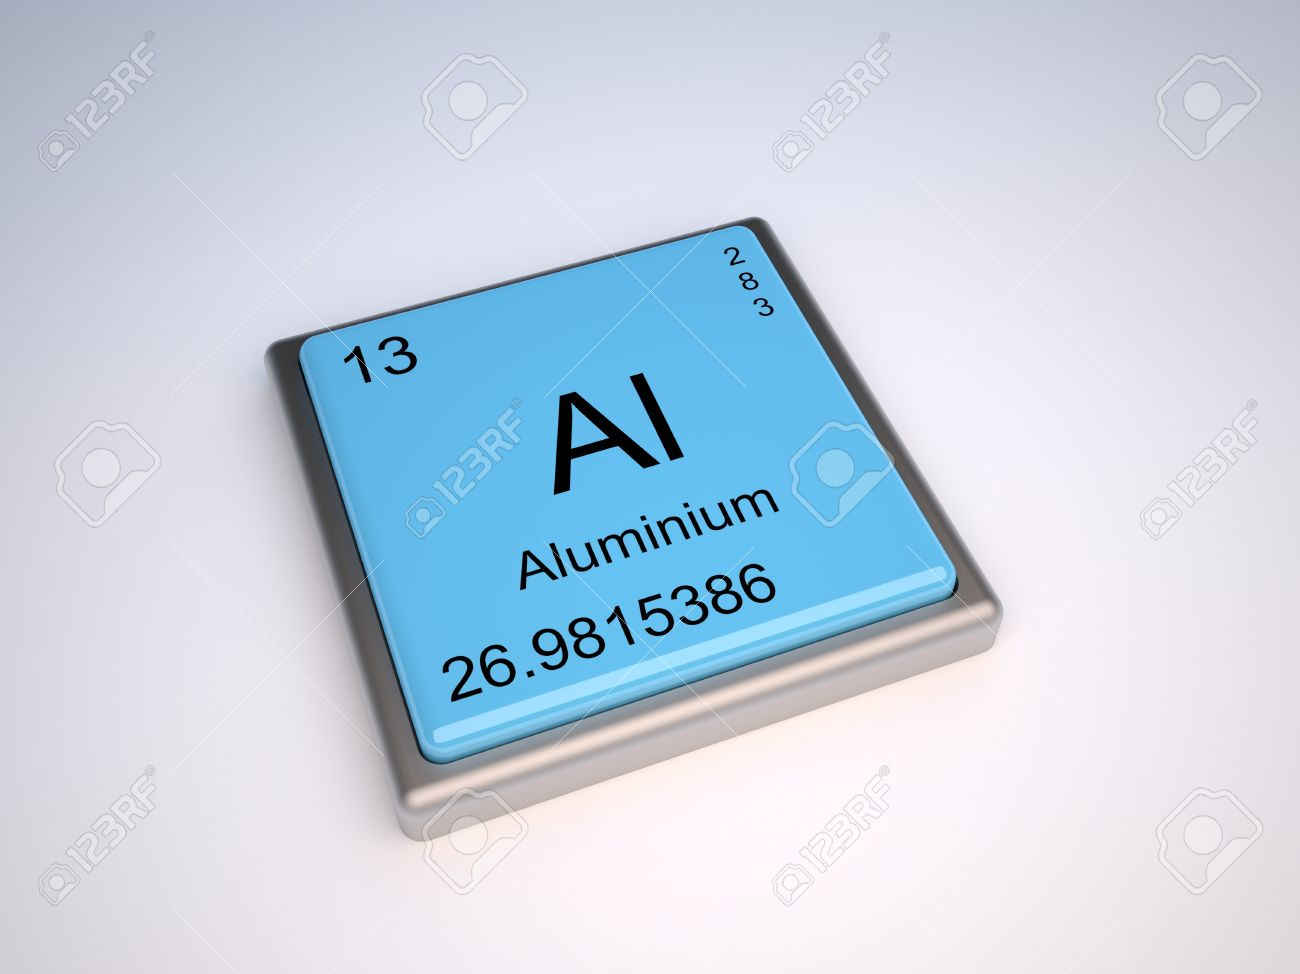 Aluminium chemical element of the periodic table with symbol Al Stock Photo - 9256924